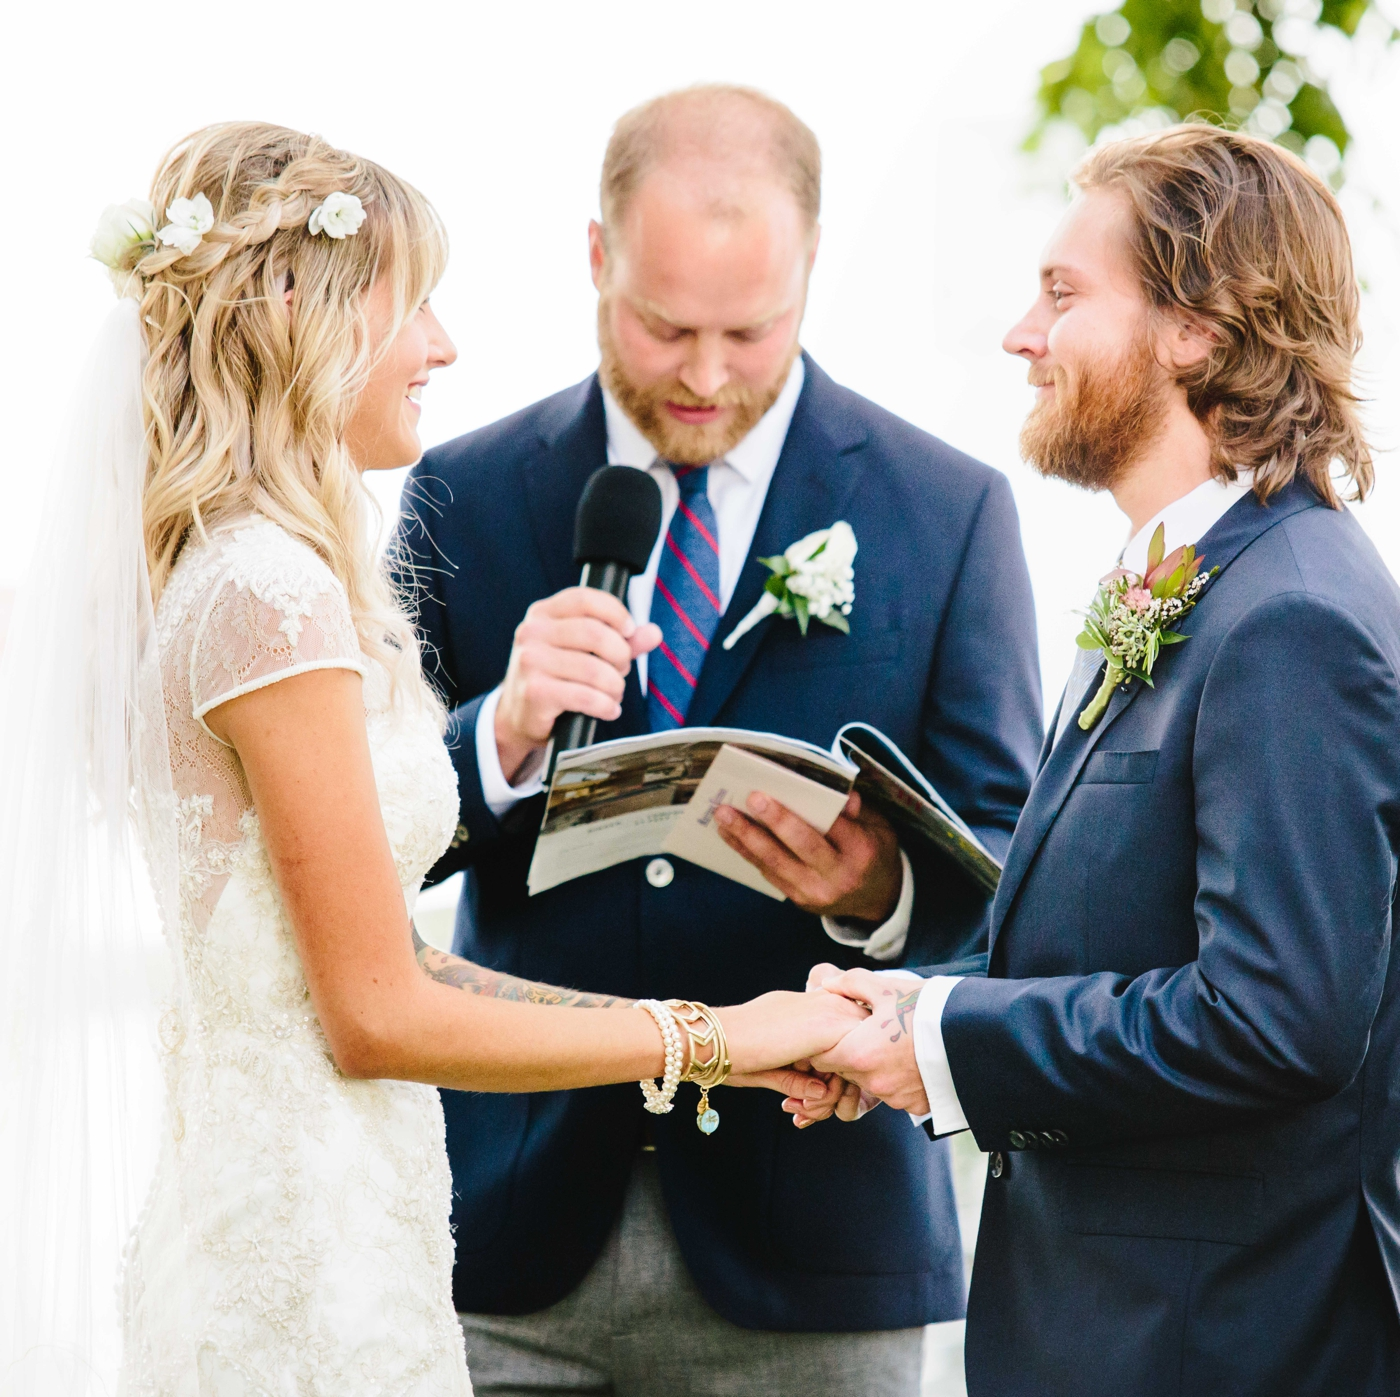 chicago-fine-art-wedding-photography-chriskelsey16